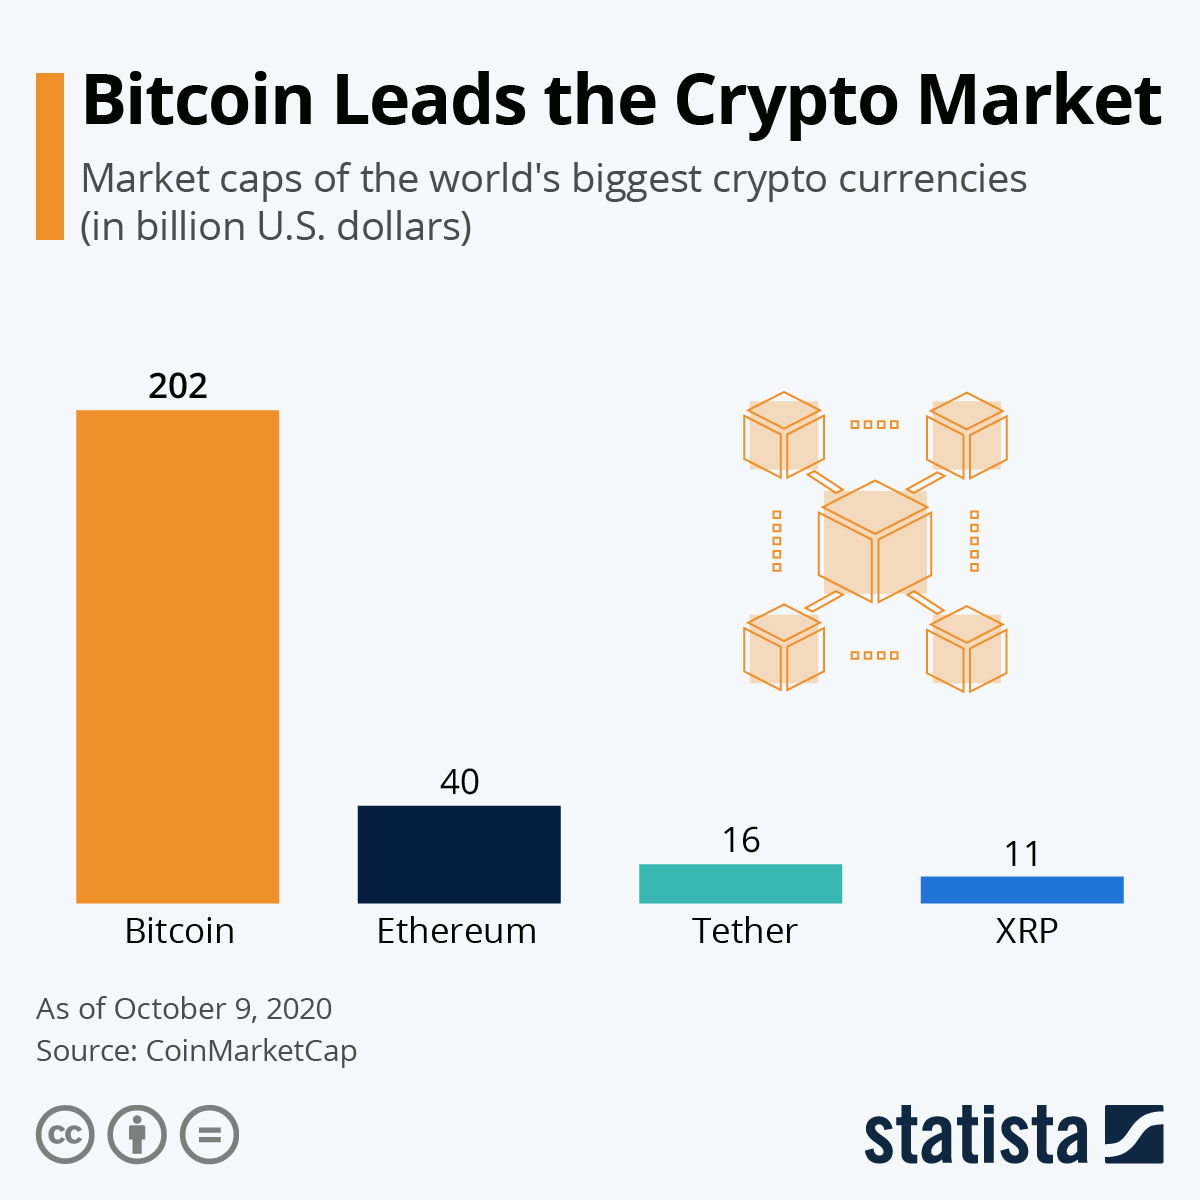 Bitcoin Leads the Crypto Market